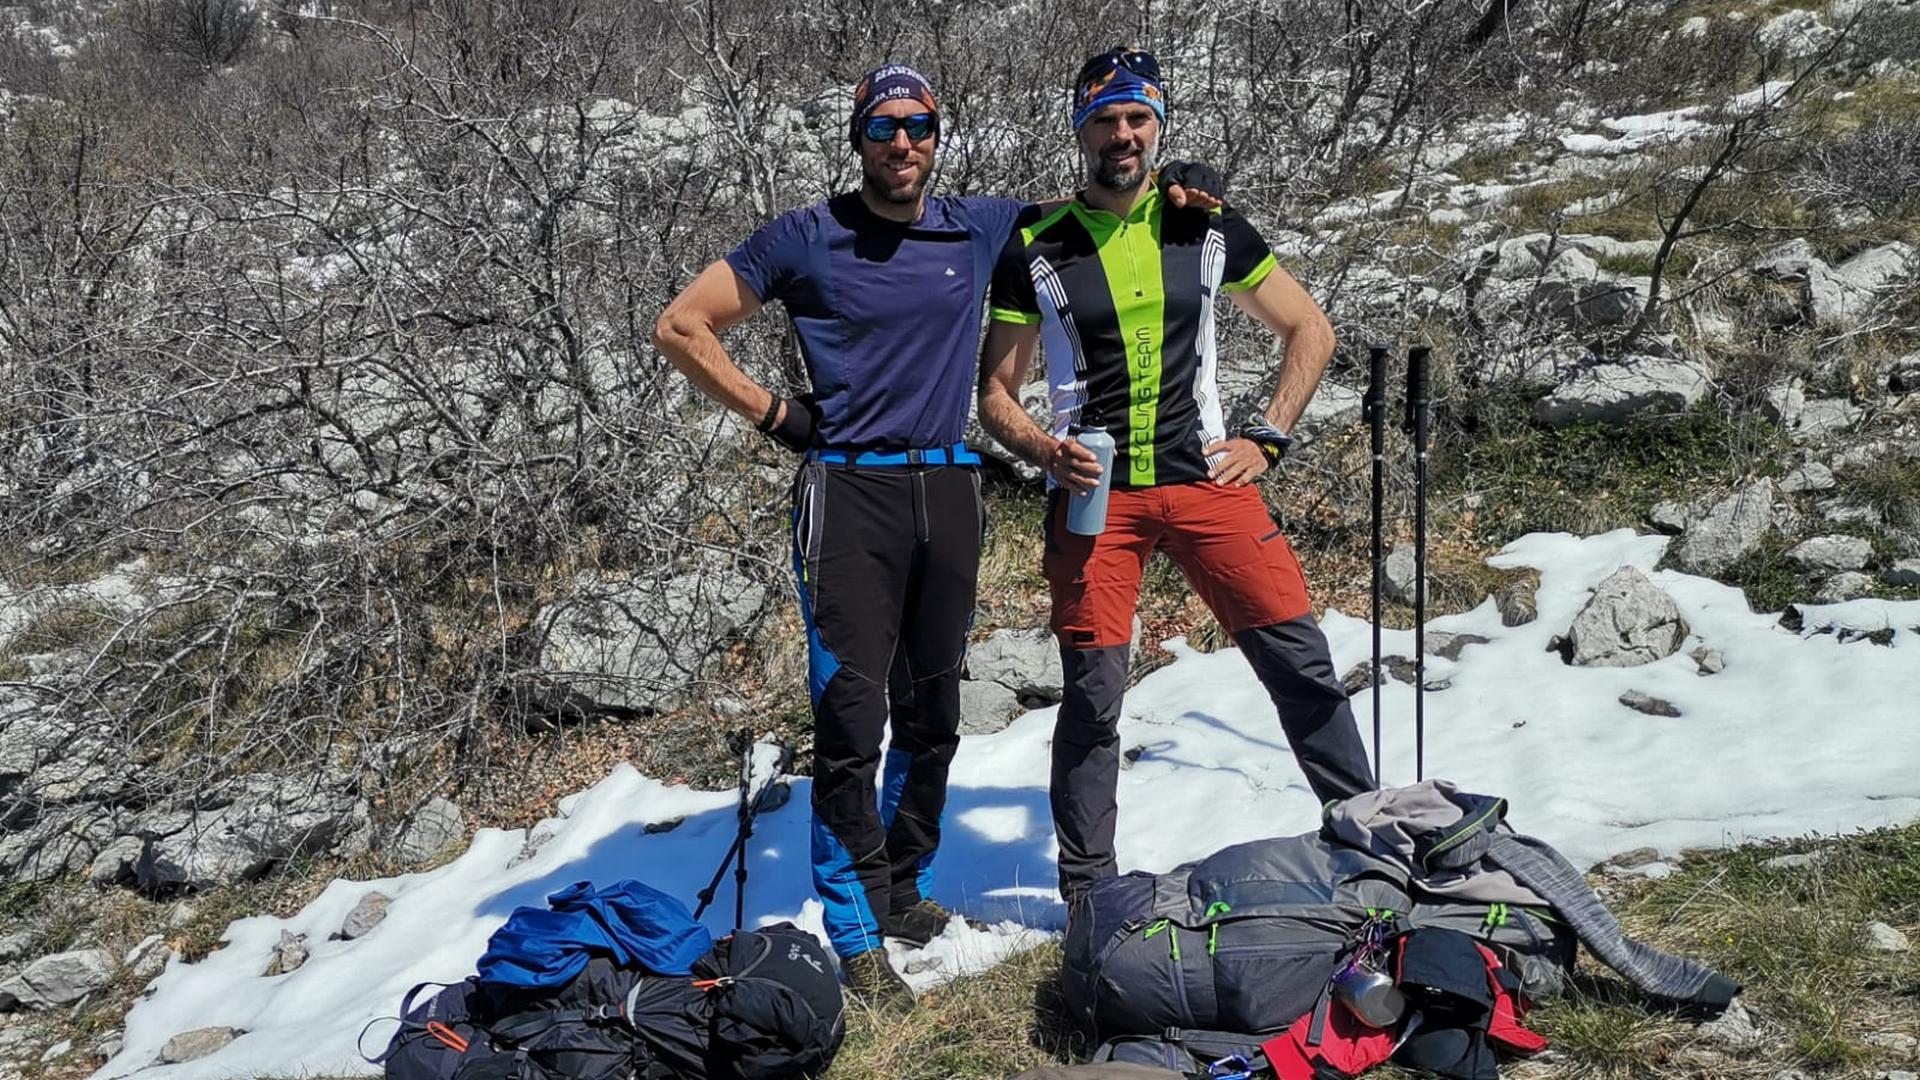 5. etapa akcije 1100 km za 1100 terapija | Daniel Lončar i Ranko Dragičević osvojili najviši vrh Velebita